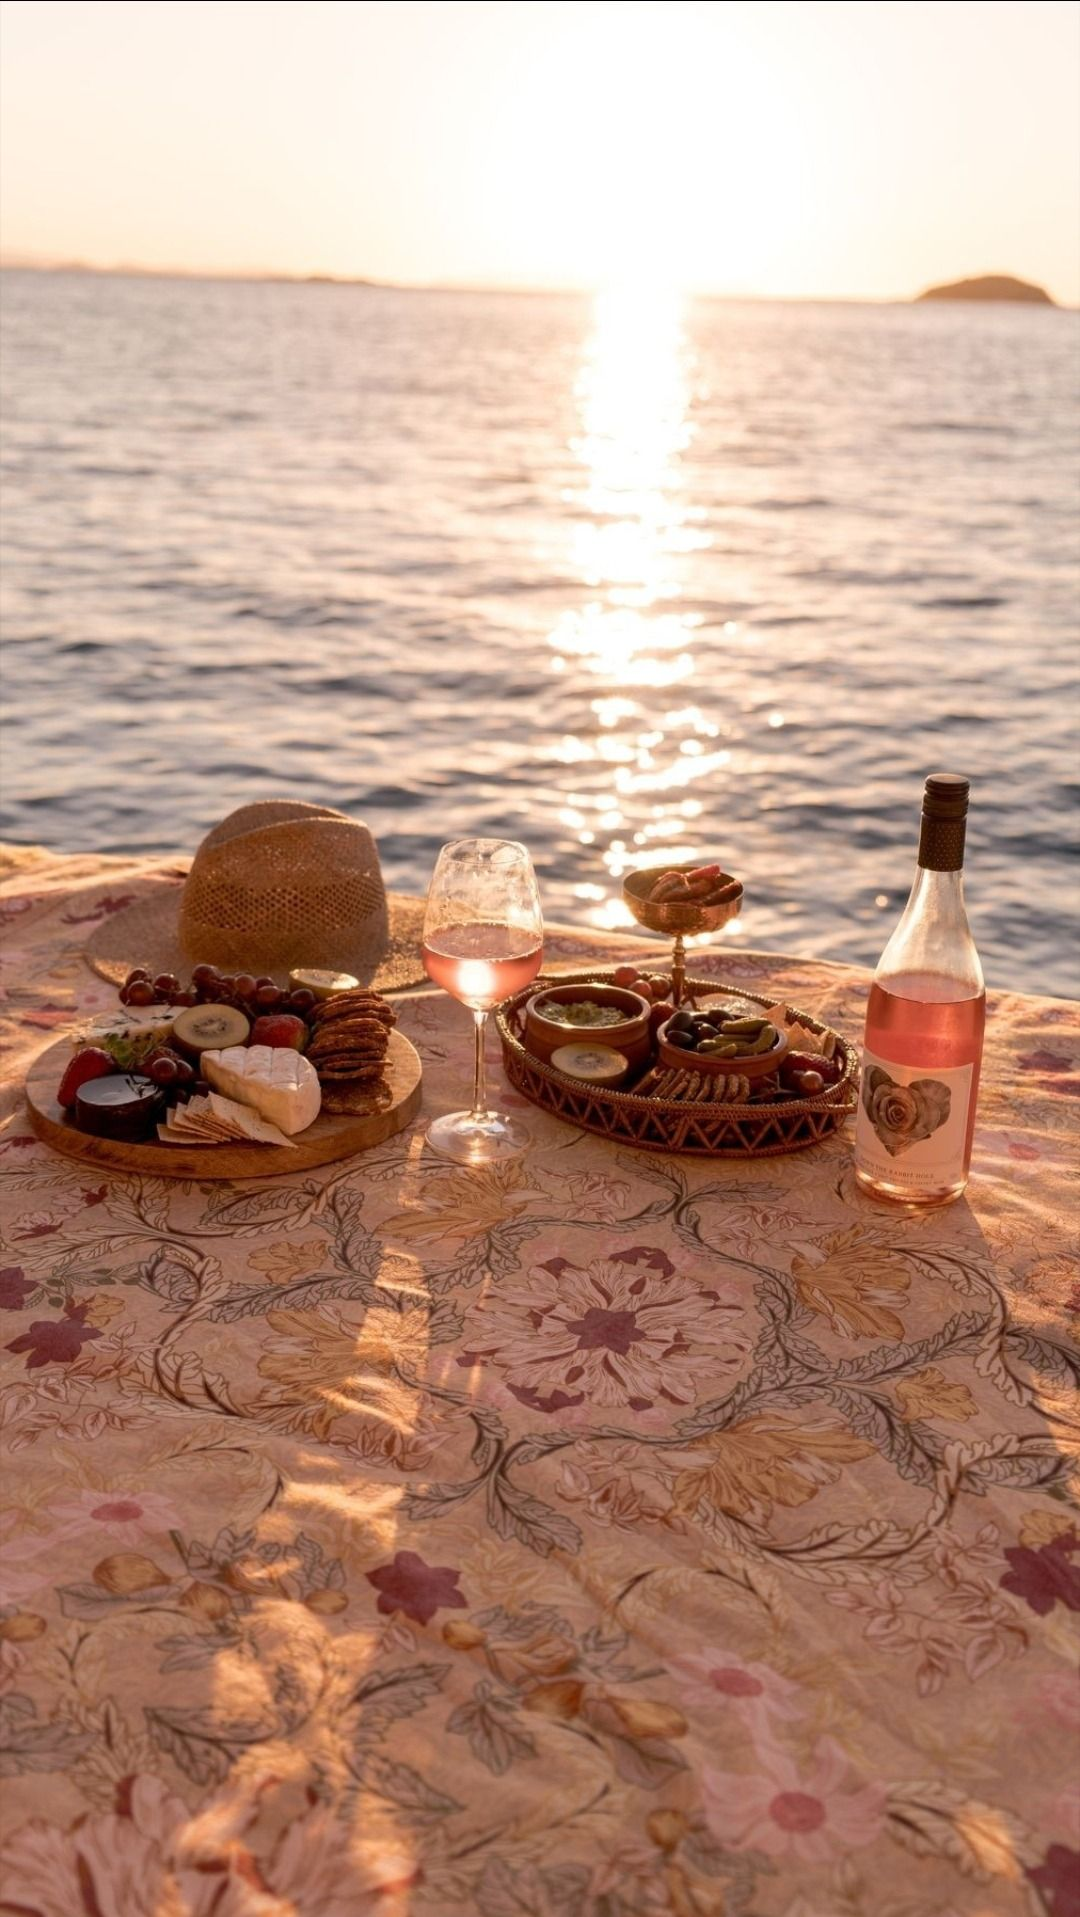 Iphone Aesthetics 159 Sunset Picnic Picnic En La Playa